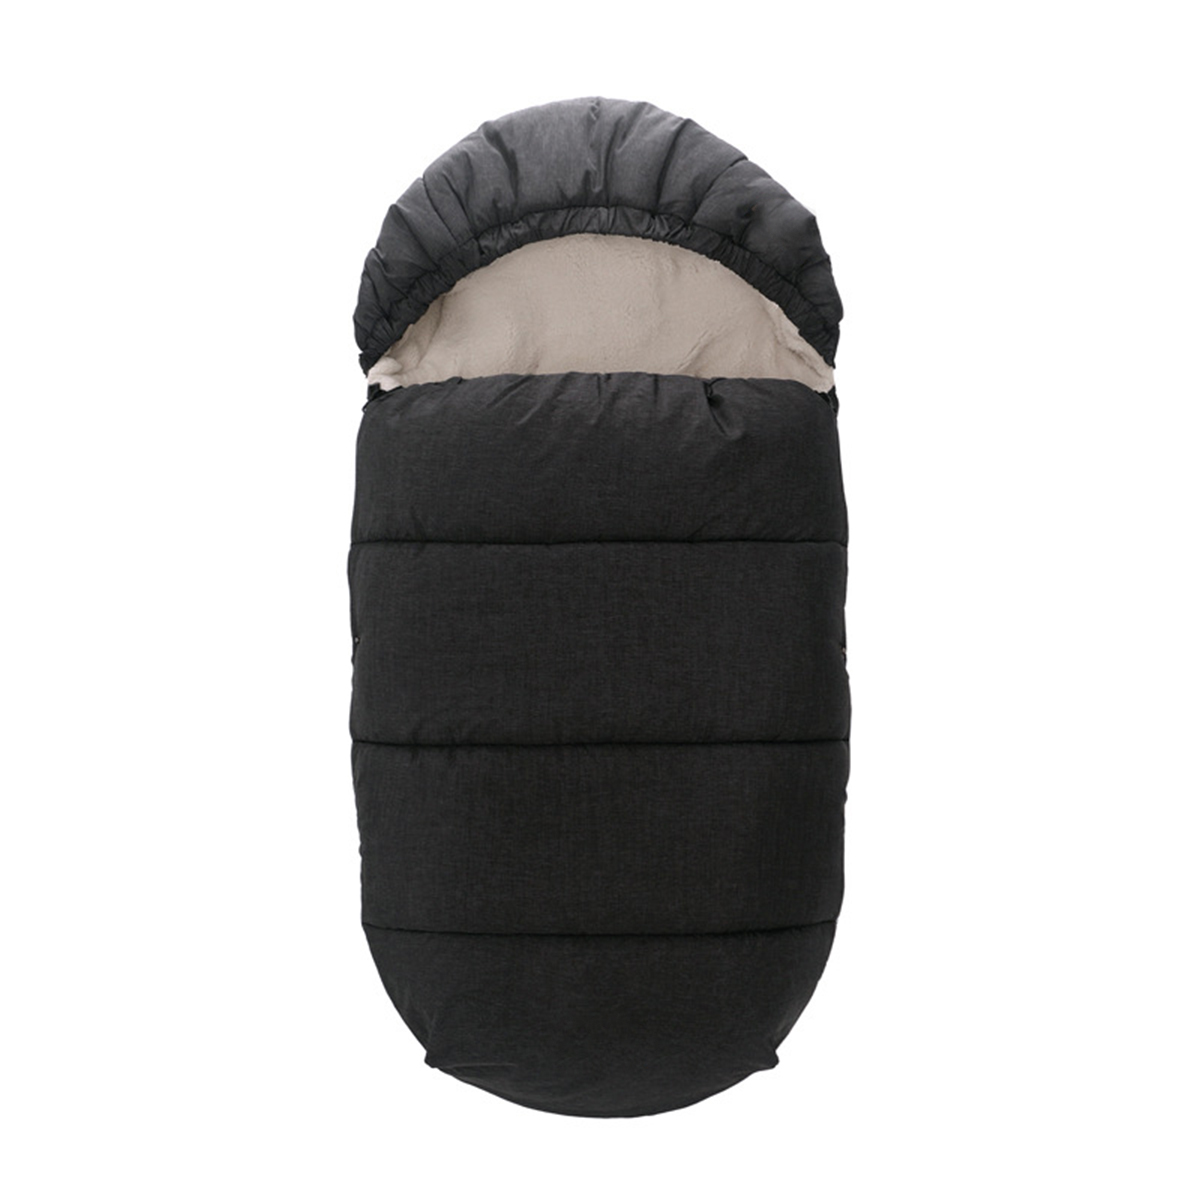 Baby Bunting Bag Winter Stroller Windproof Warm Sleeping Bag Toddler Footmuff for Car Seat Stroller